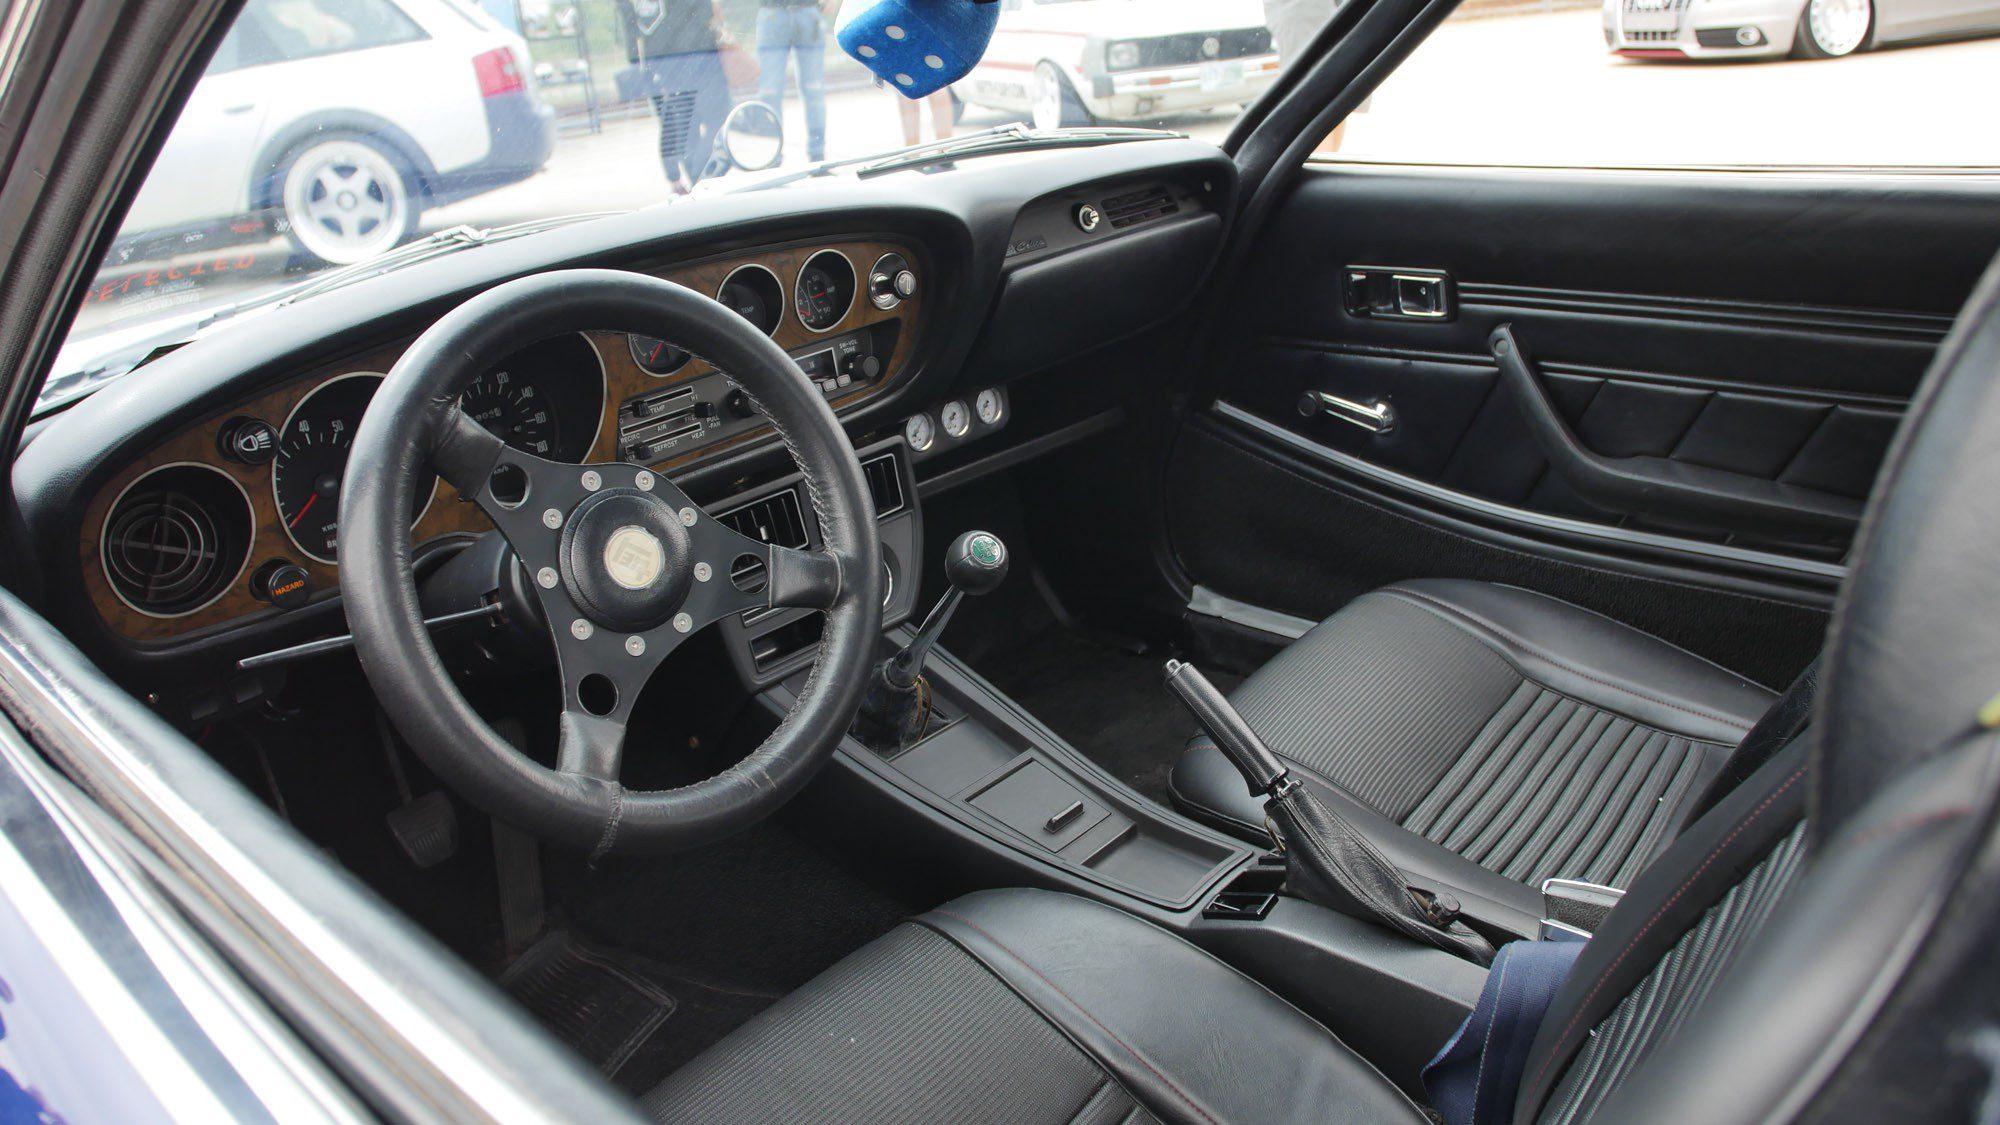 Innenraum des Toyota Celica